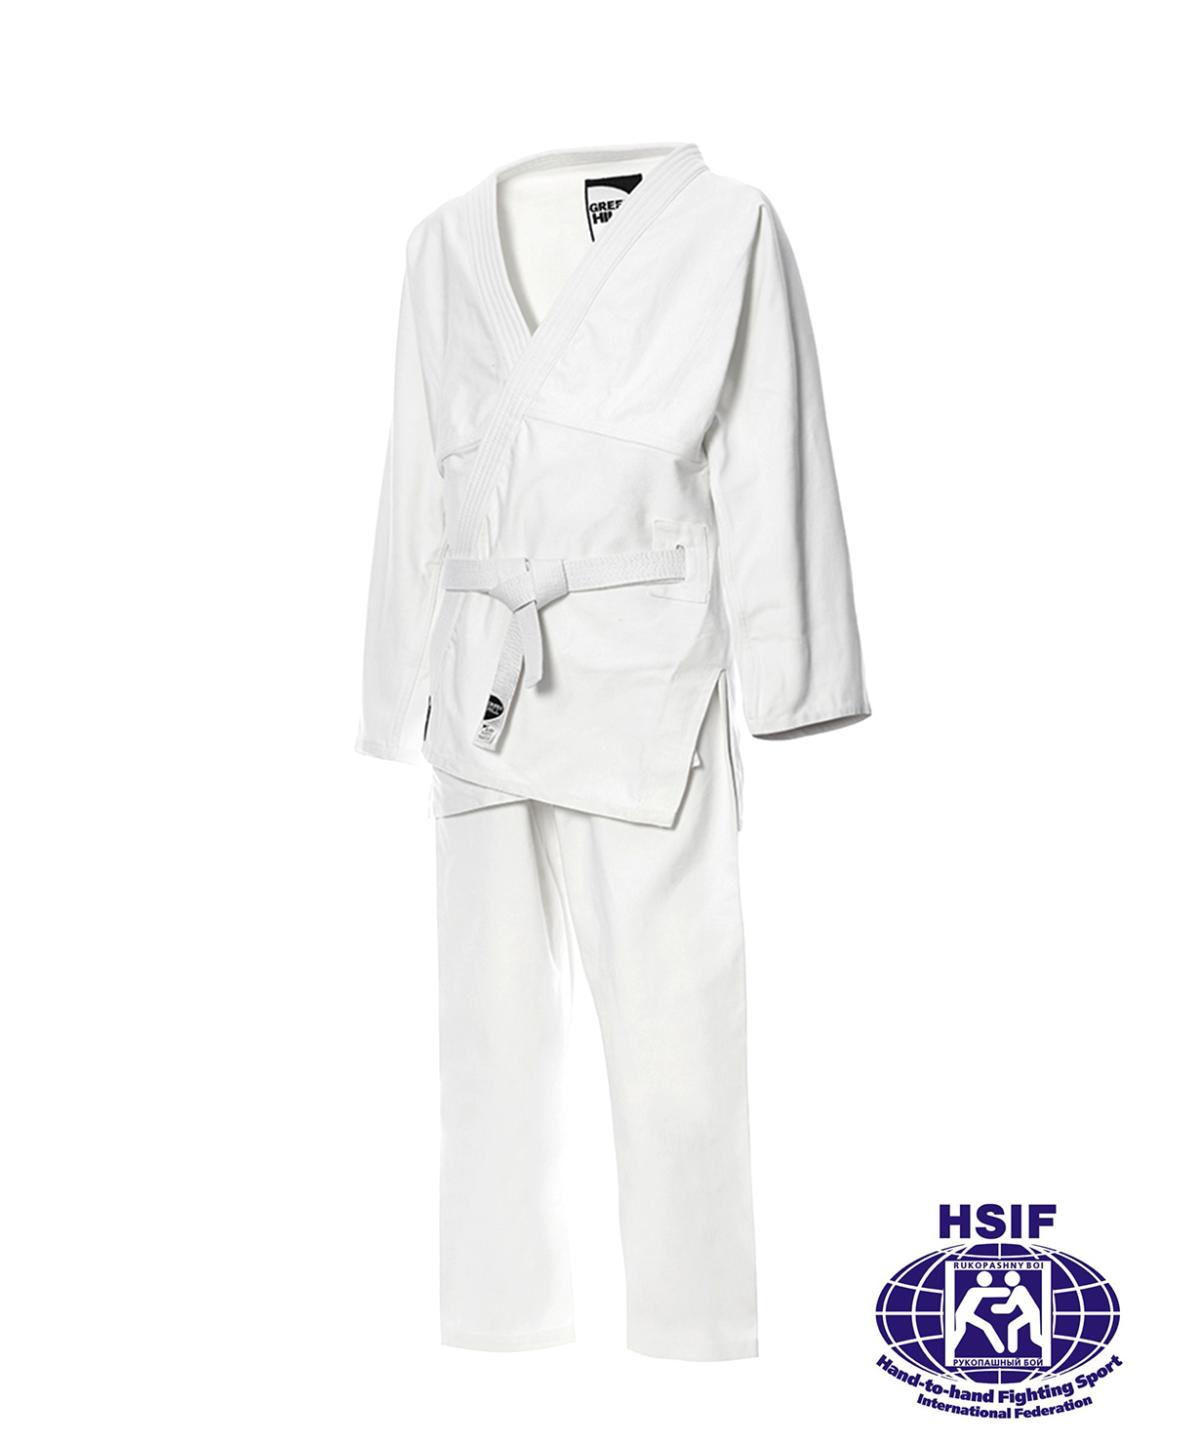 GREEN HILL Кимоно для рукопашного боя р.2/150 Junior  SHH-2210 - 1